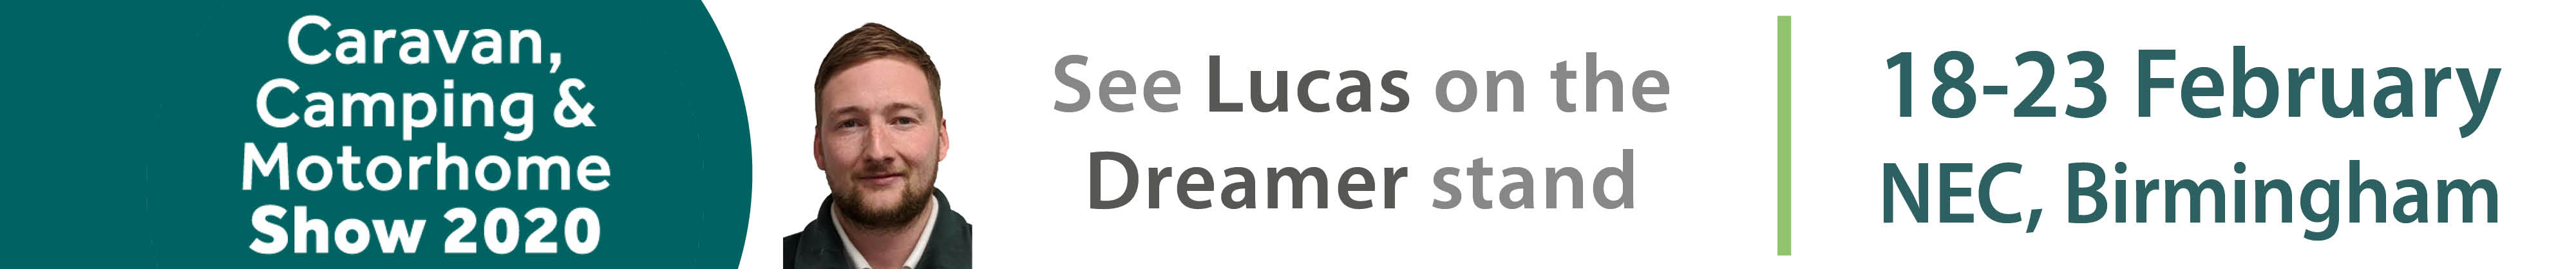 NEC Feb 2020 - Dreamer